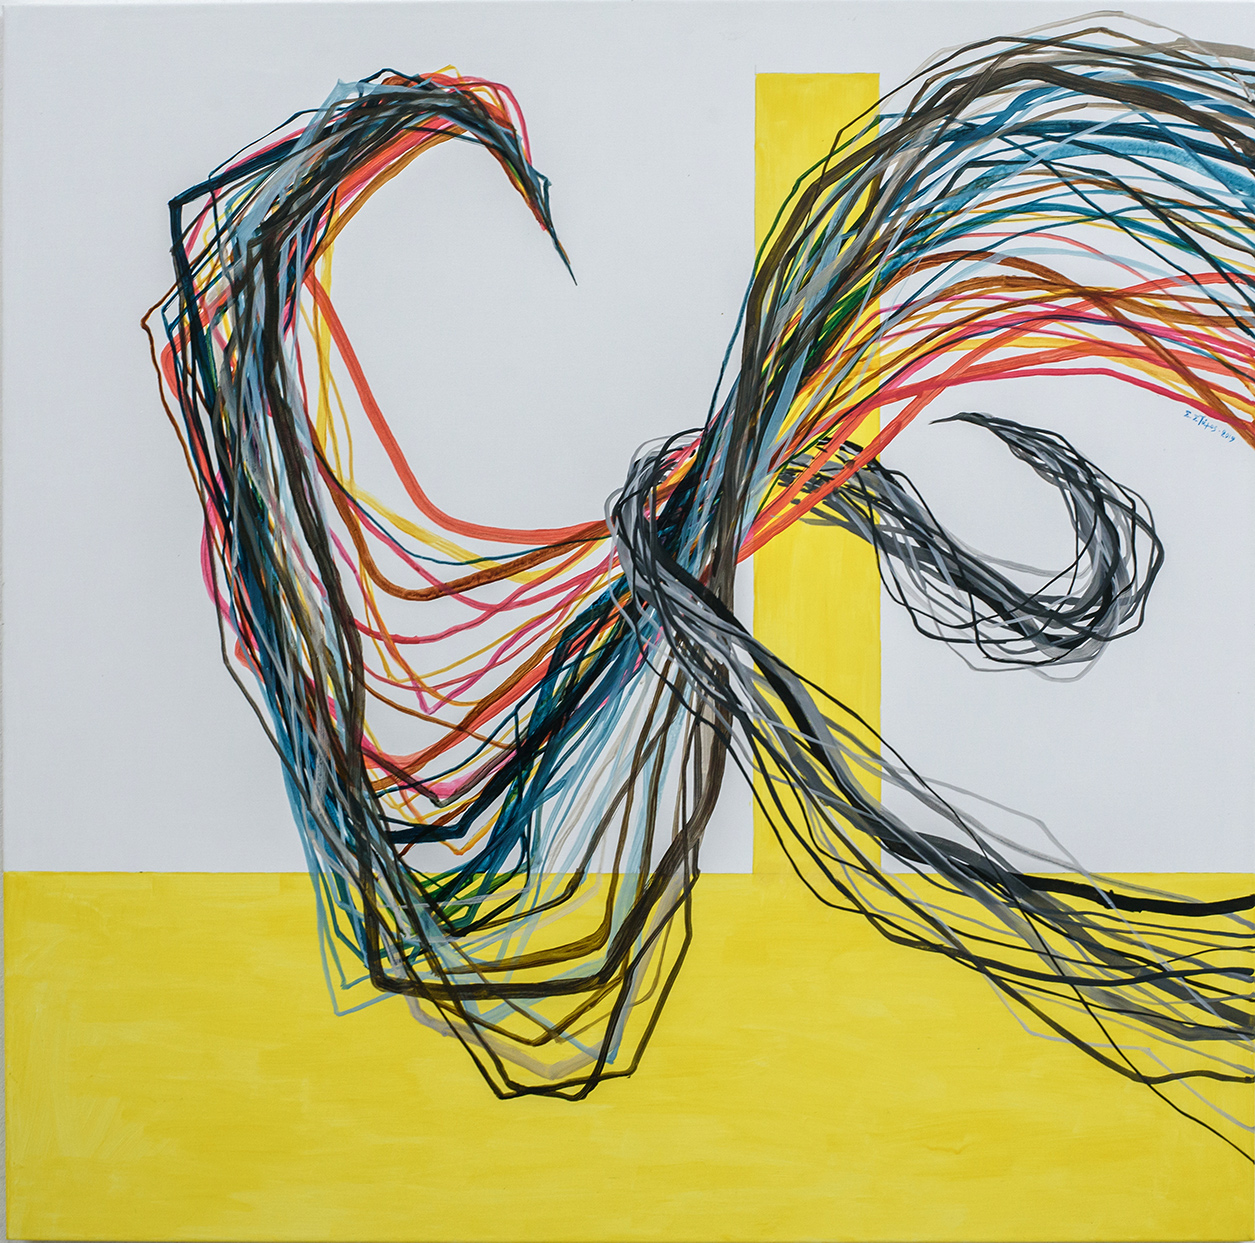 Untitled, Acrylics on canvas, 100 x 100 cm, 2019, Trikala